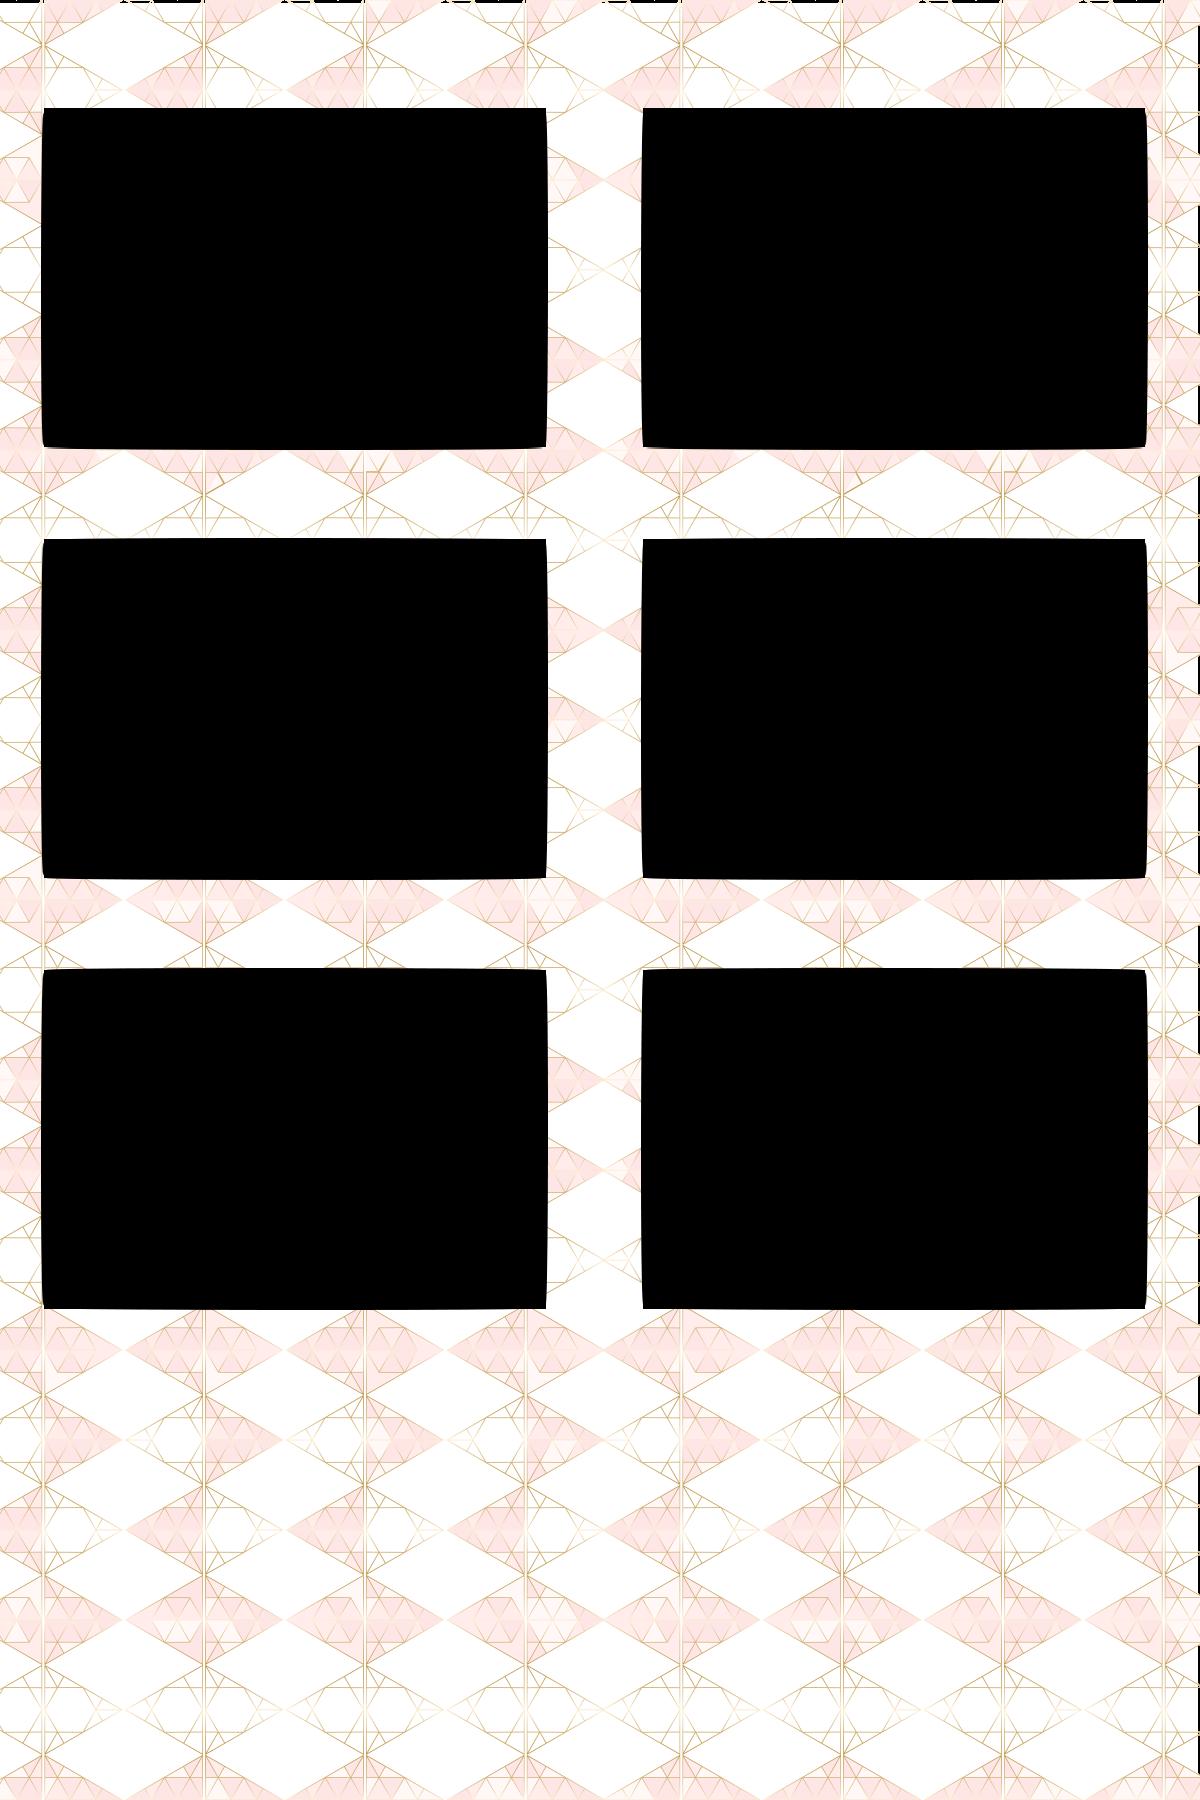 Strip_H3_Pink.png